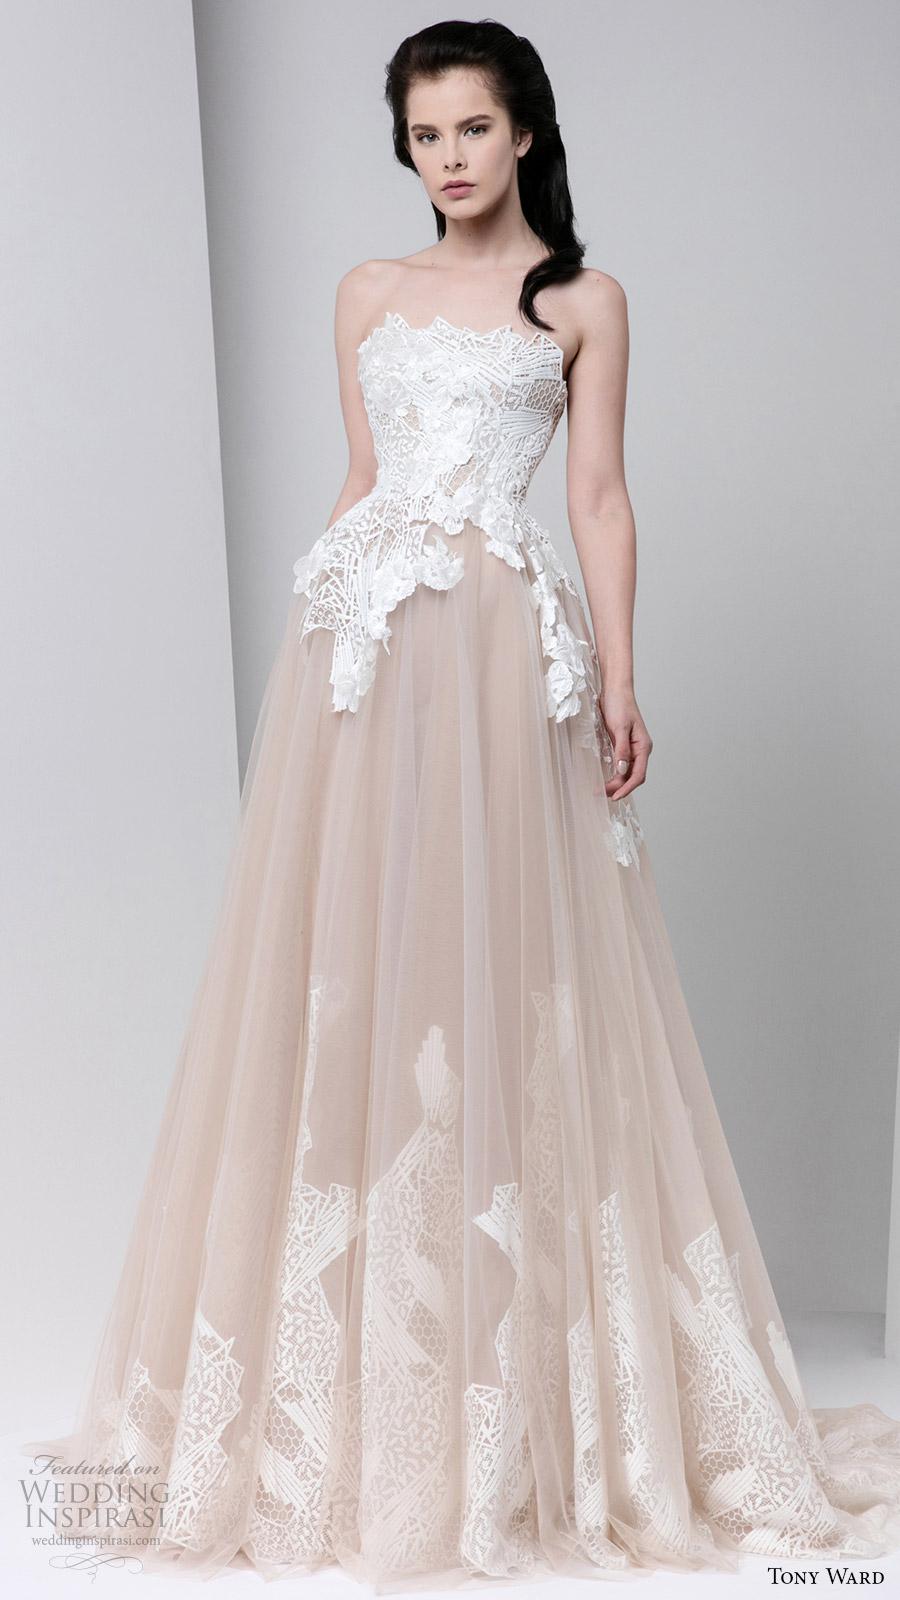 tony ward fall winter 2016 2017 rtw strapless ball gown off white evening dress wedding inspiration